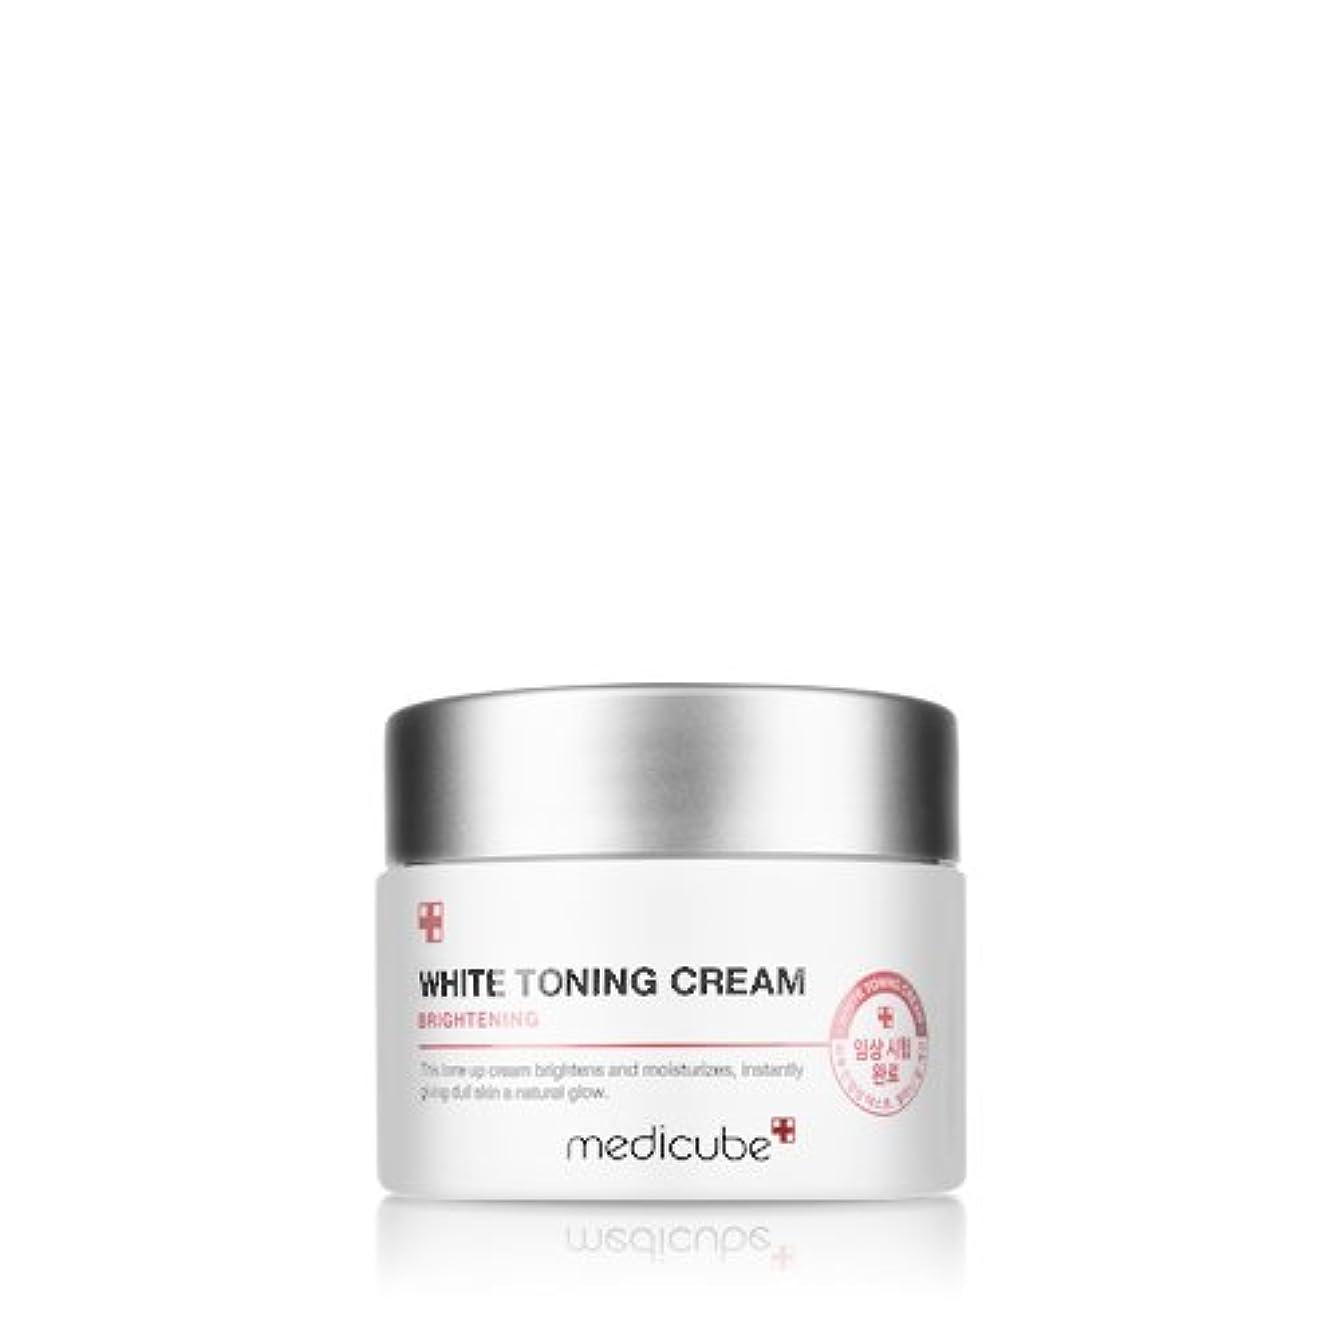 [Medicube] WHITE TONING CREAM / メディキューブ ホワイトトーニングクリーム / 正品?海外直送商品